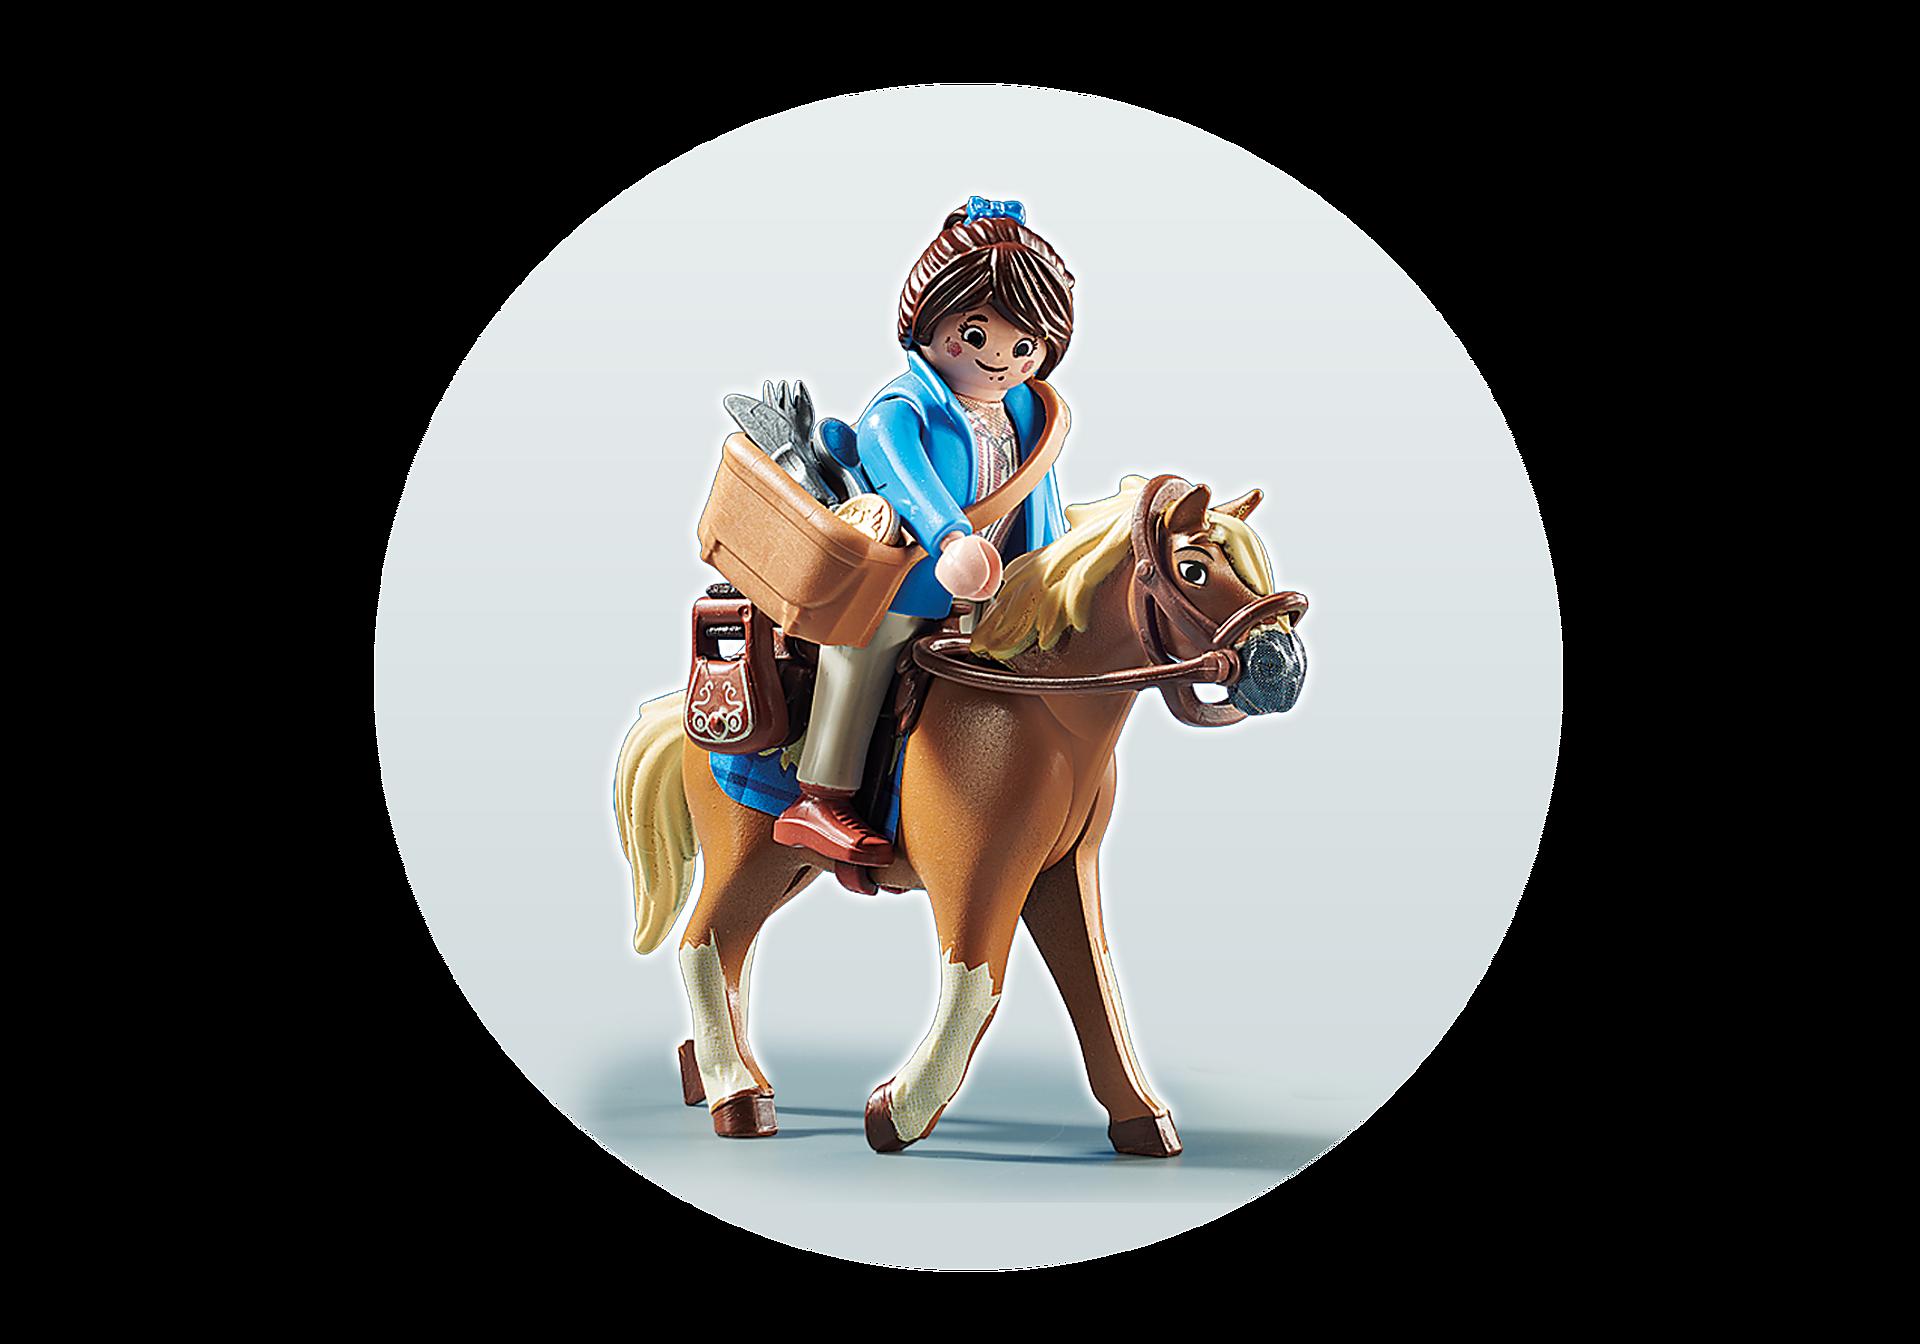 70072 PLAYMOBIL: THE MOVIE Marla avec cheval  zoom image4